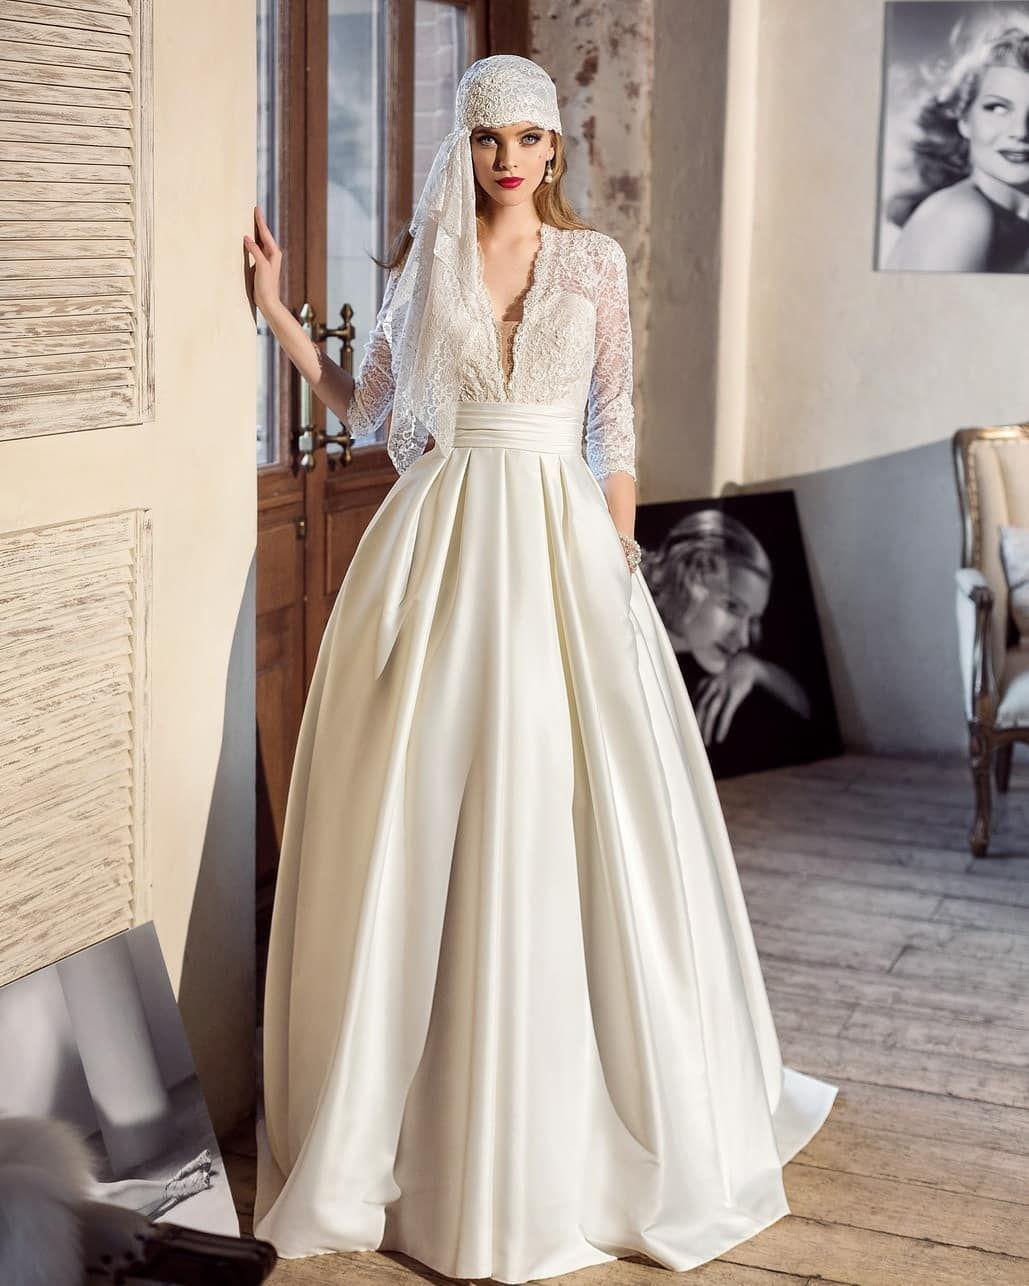 Pin by Weddings - Hochzeiten on ファッション  Wedding dress long